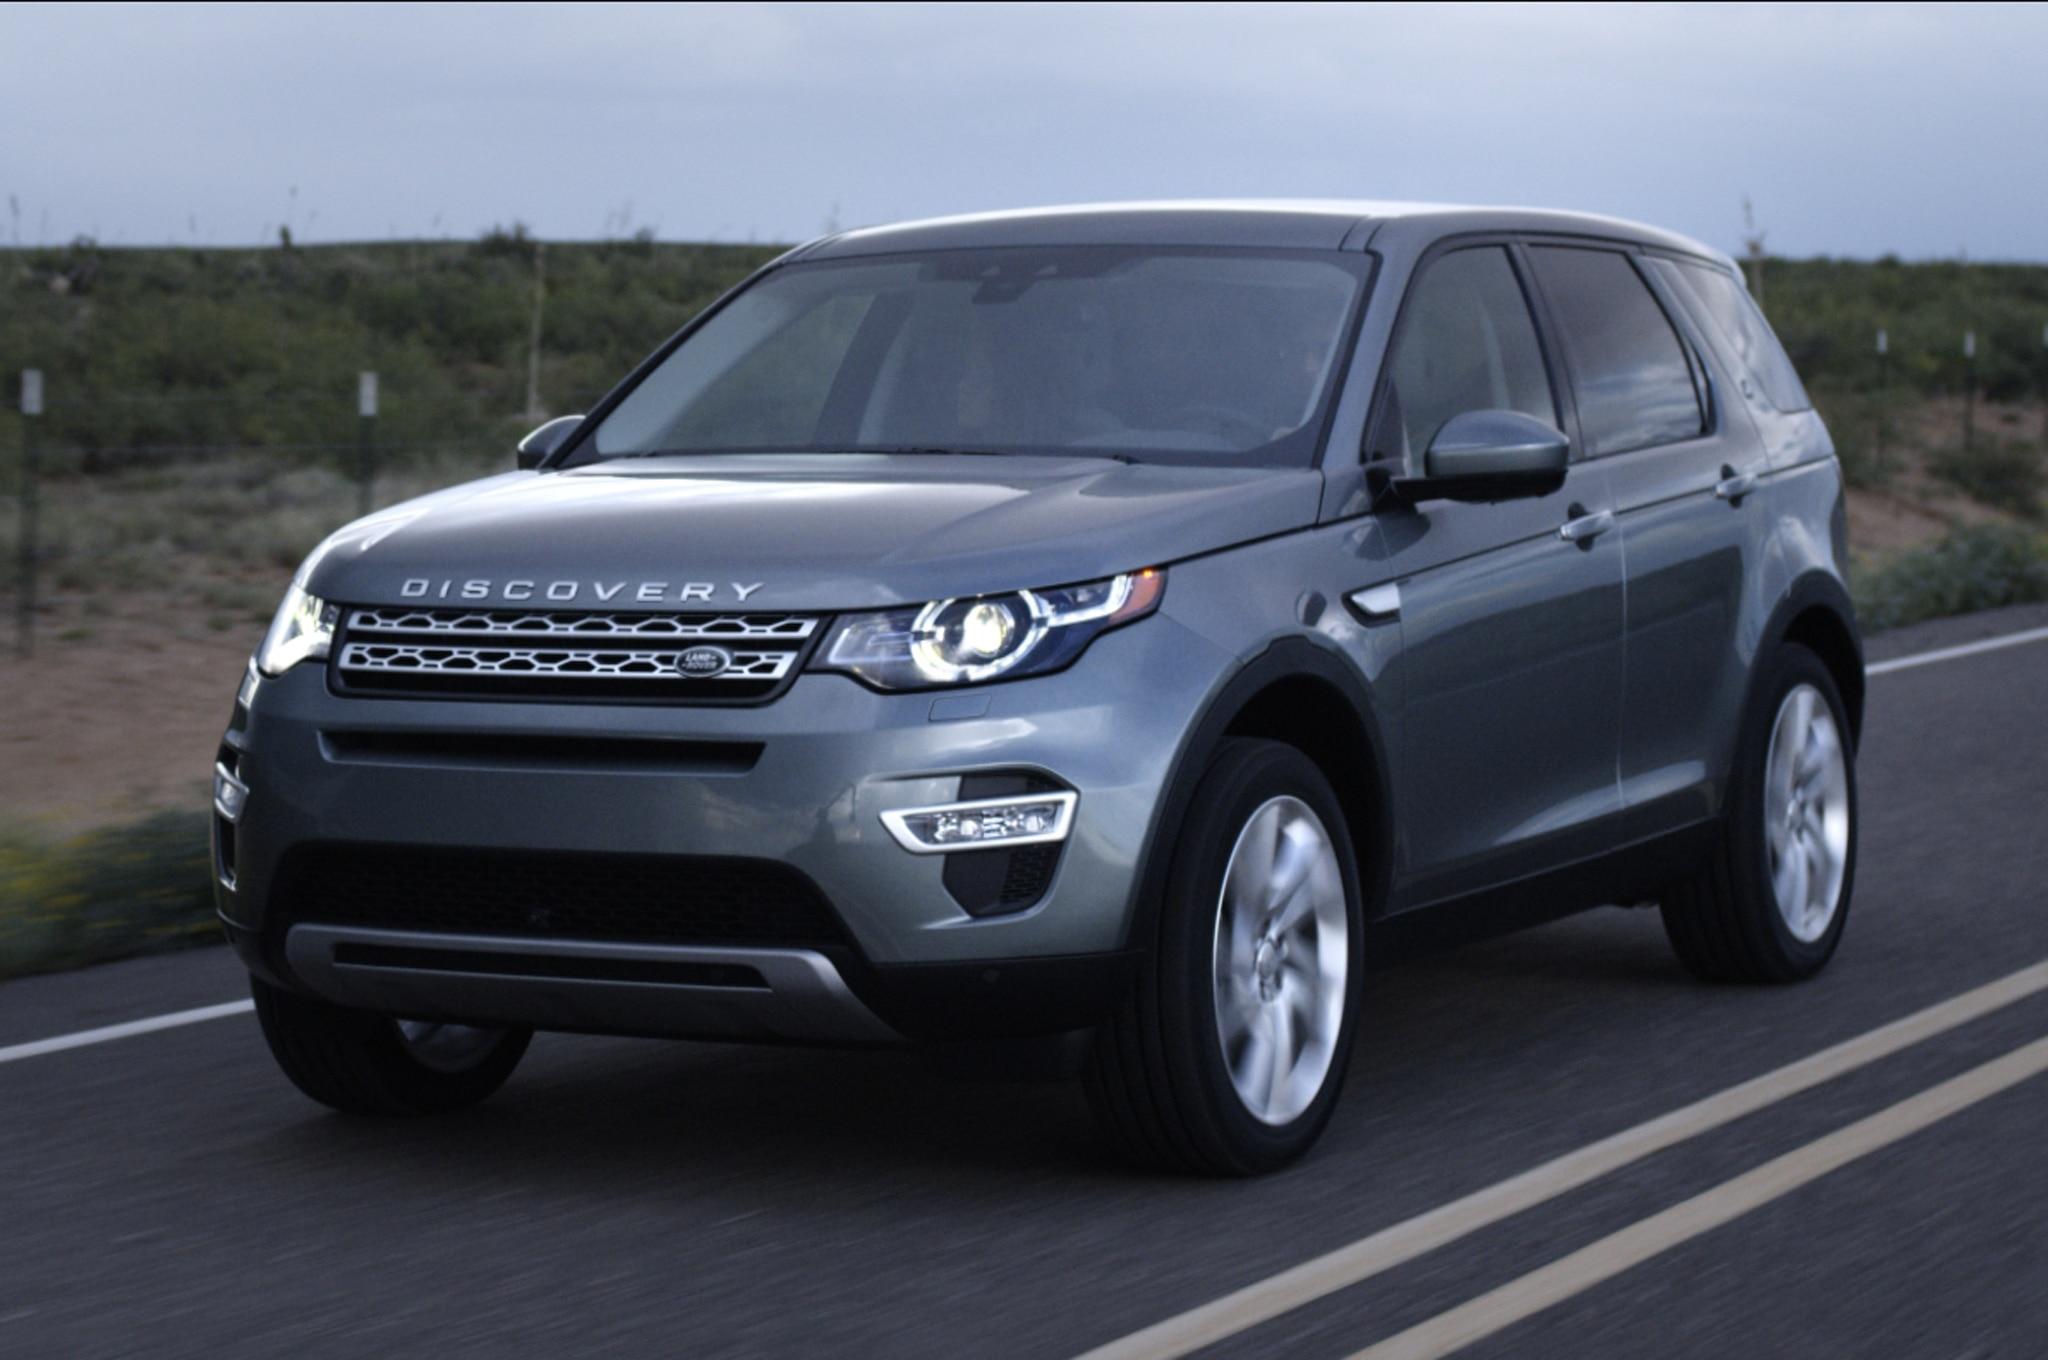 land rover discovery sport 2015 disponible desde 37 995 d lares. Black Bedroom Furniture Sets. Home Design Ideas